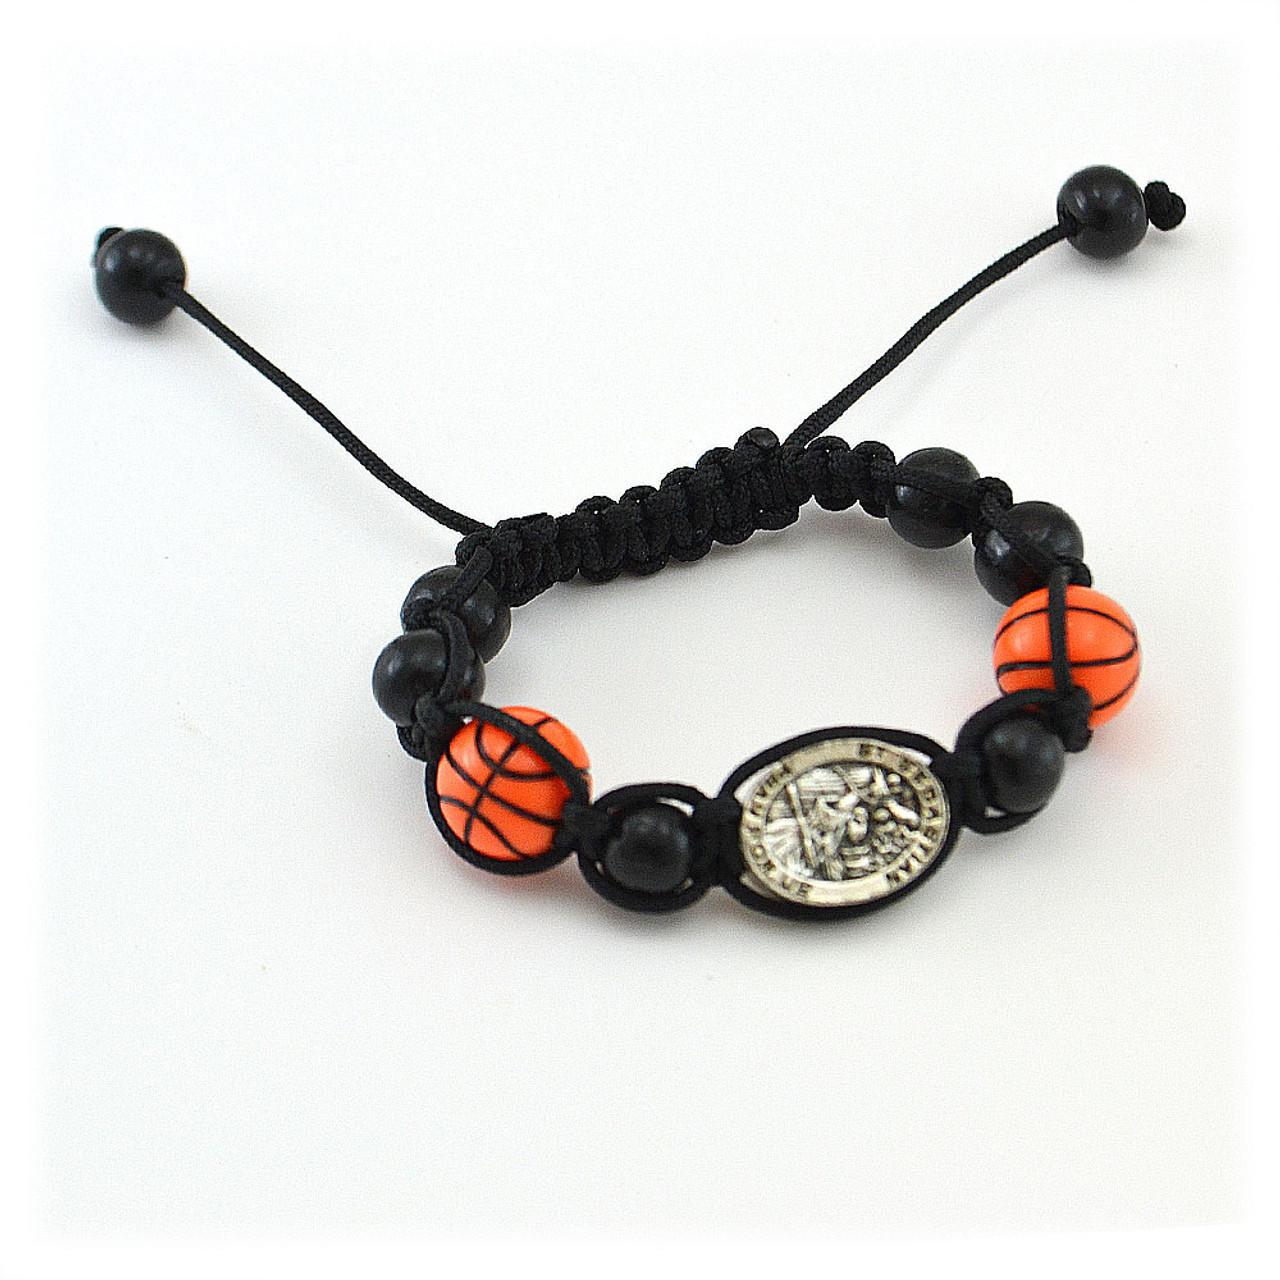 Basketball Sports Bracelet With Medal